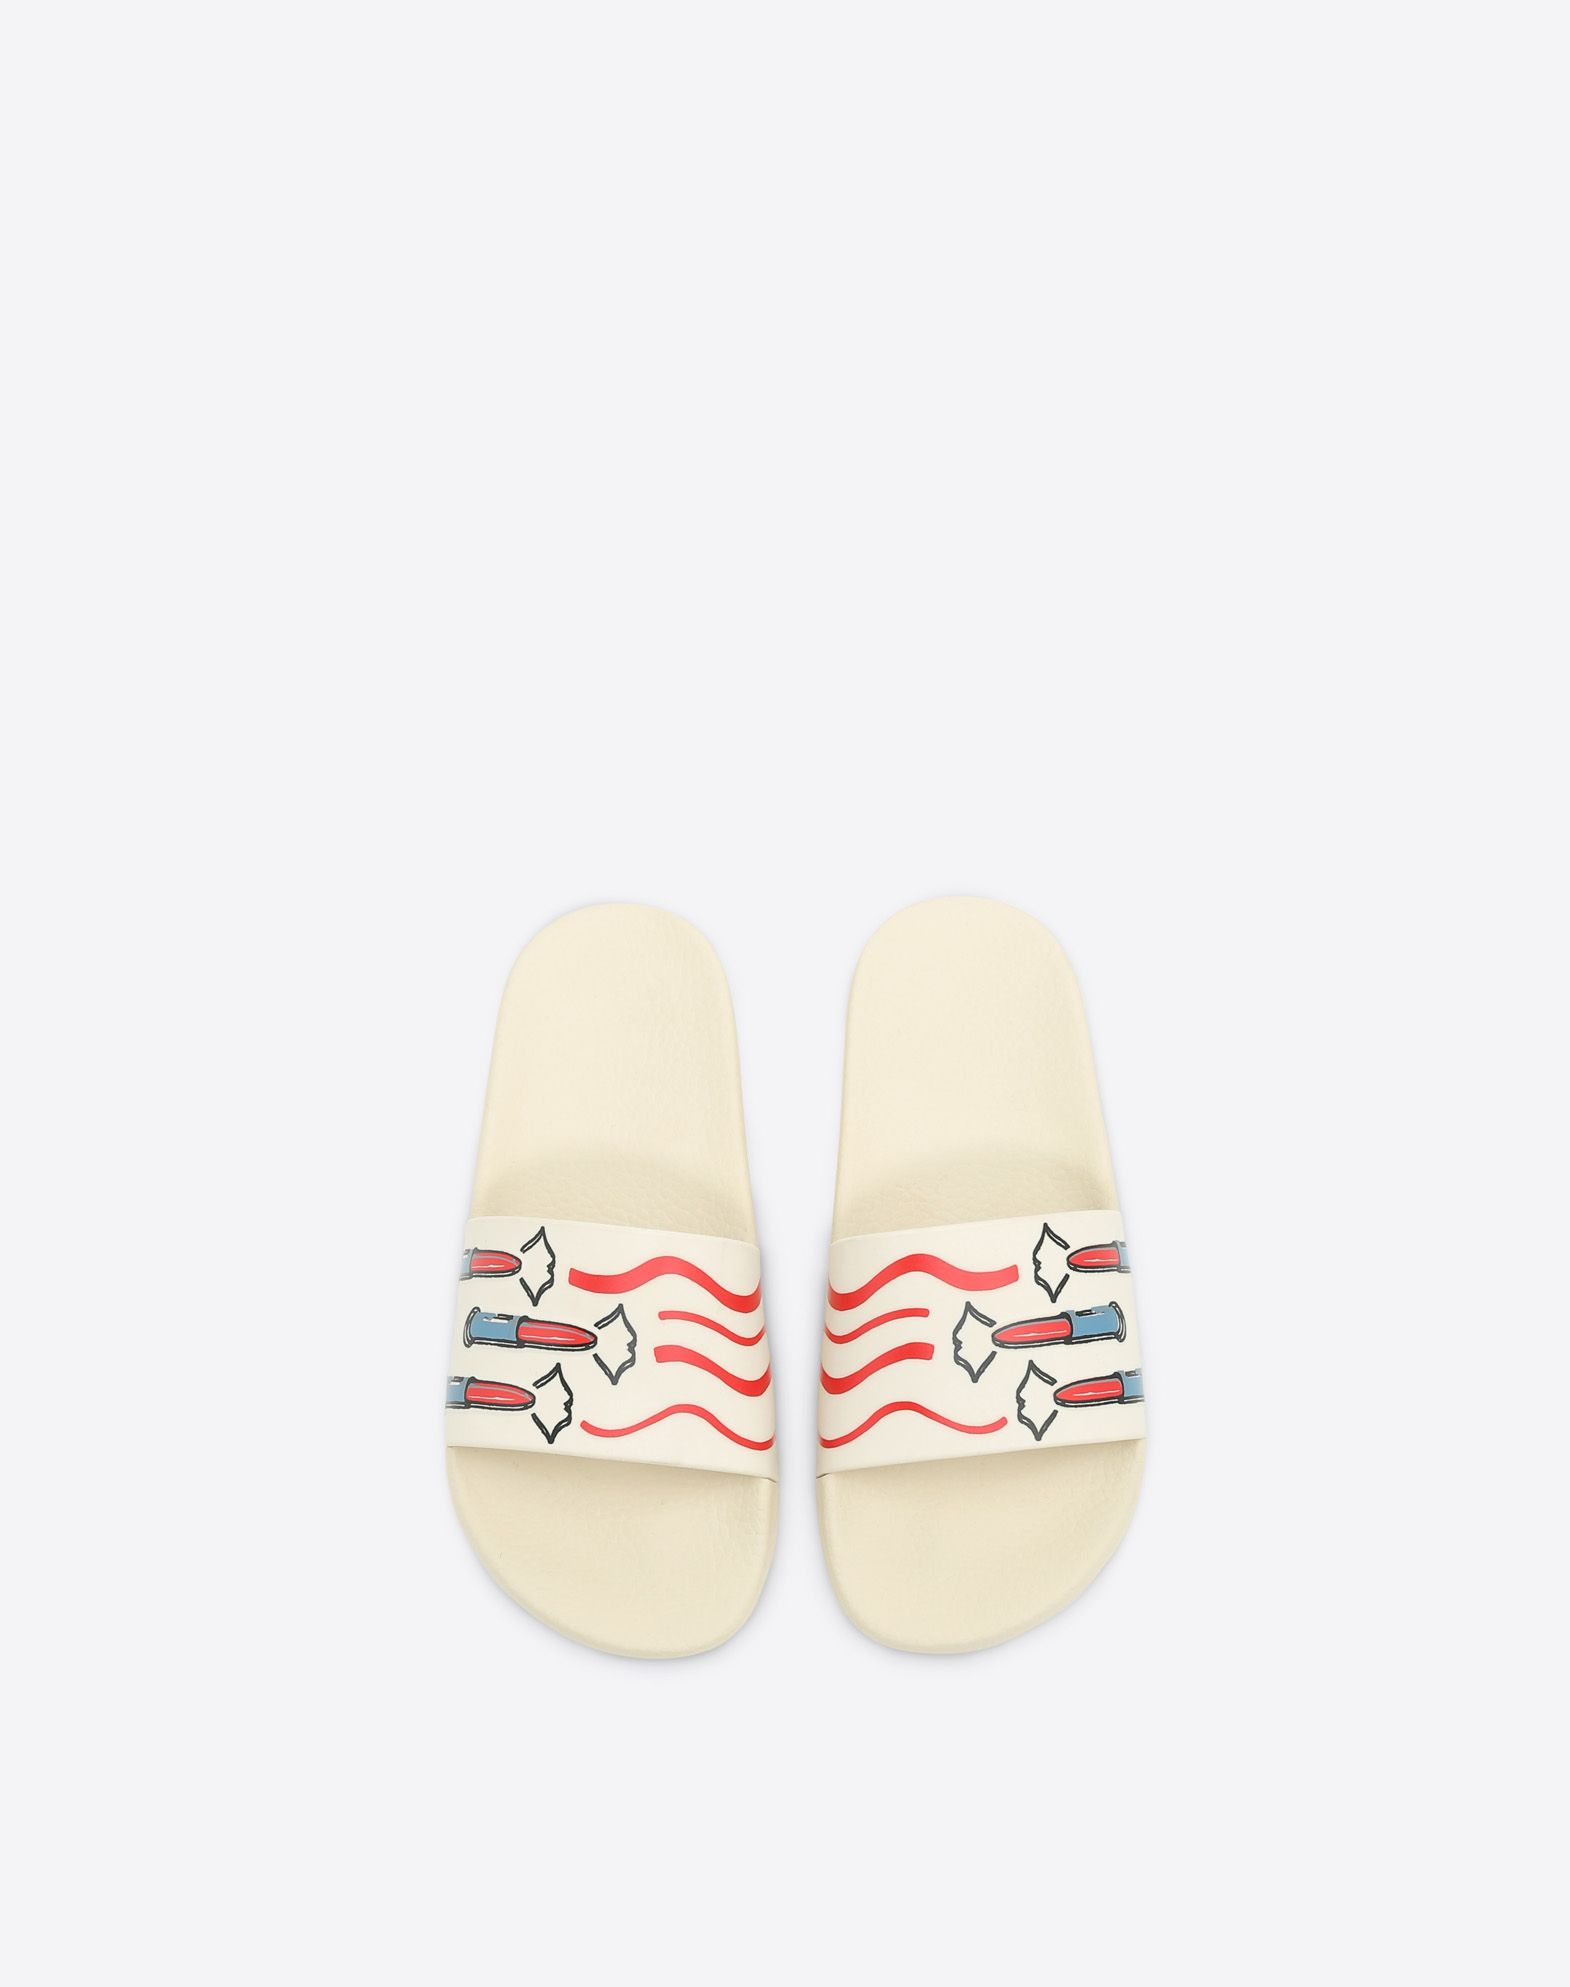 VALENTINO GARAVANI PVC Slide Sandal with Lipstick Print SLIDE SANDAL D e